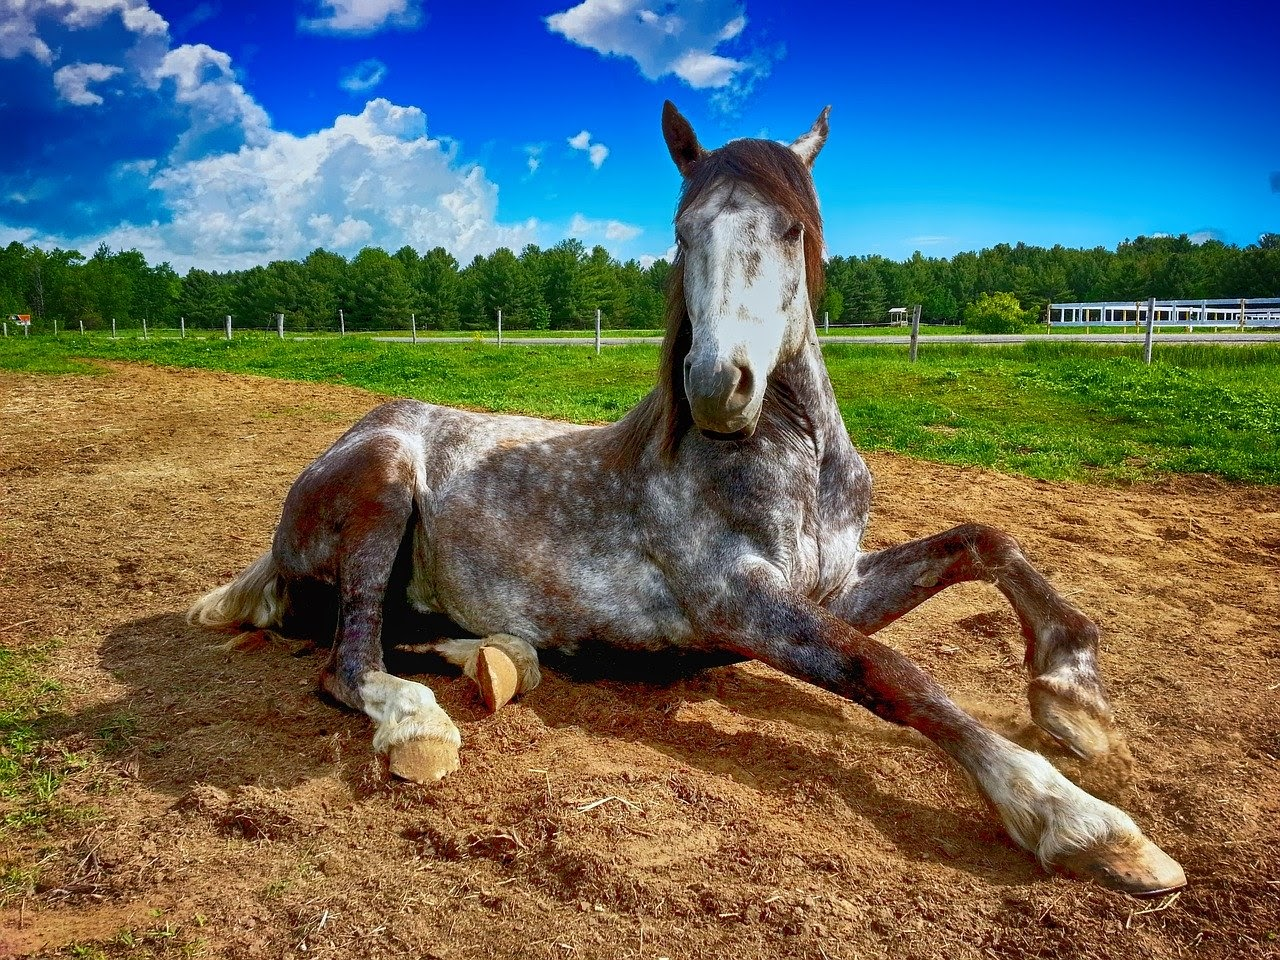 A horse sitting in a field